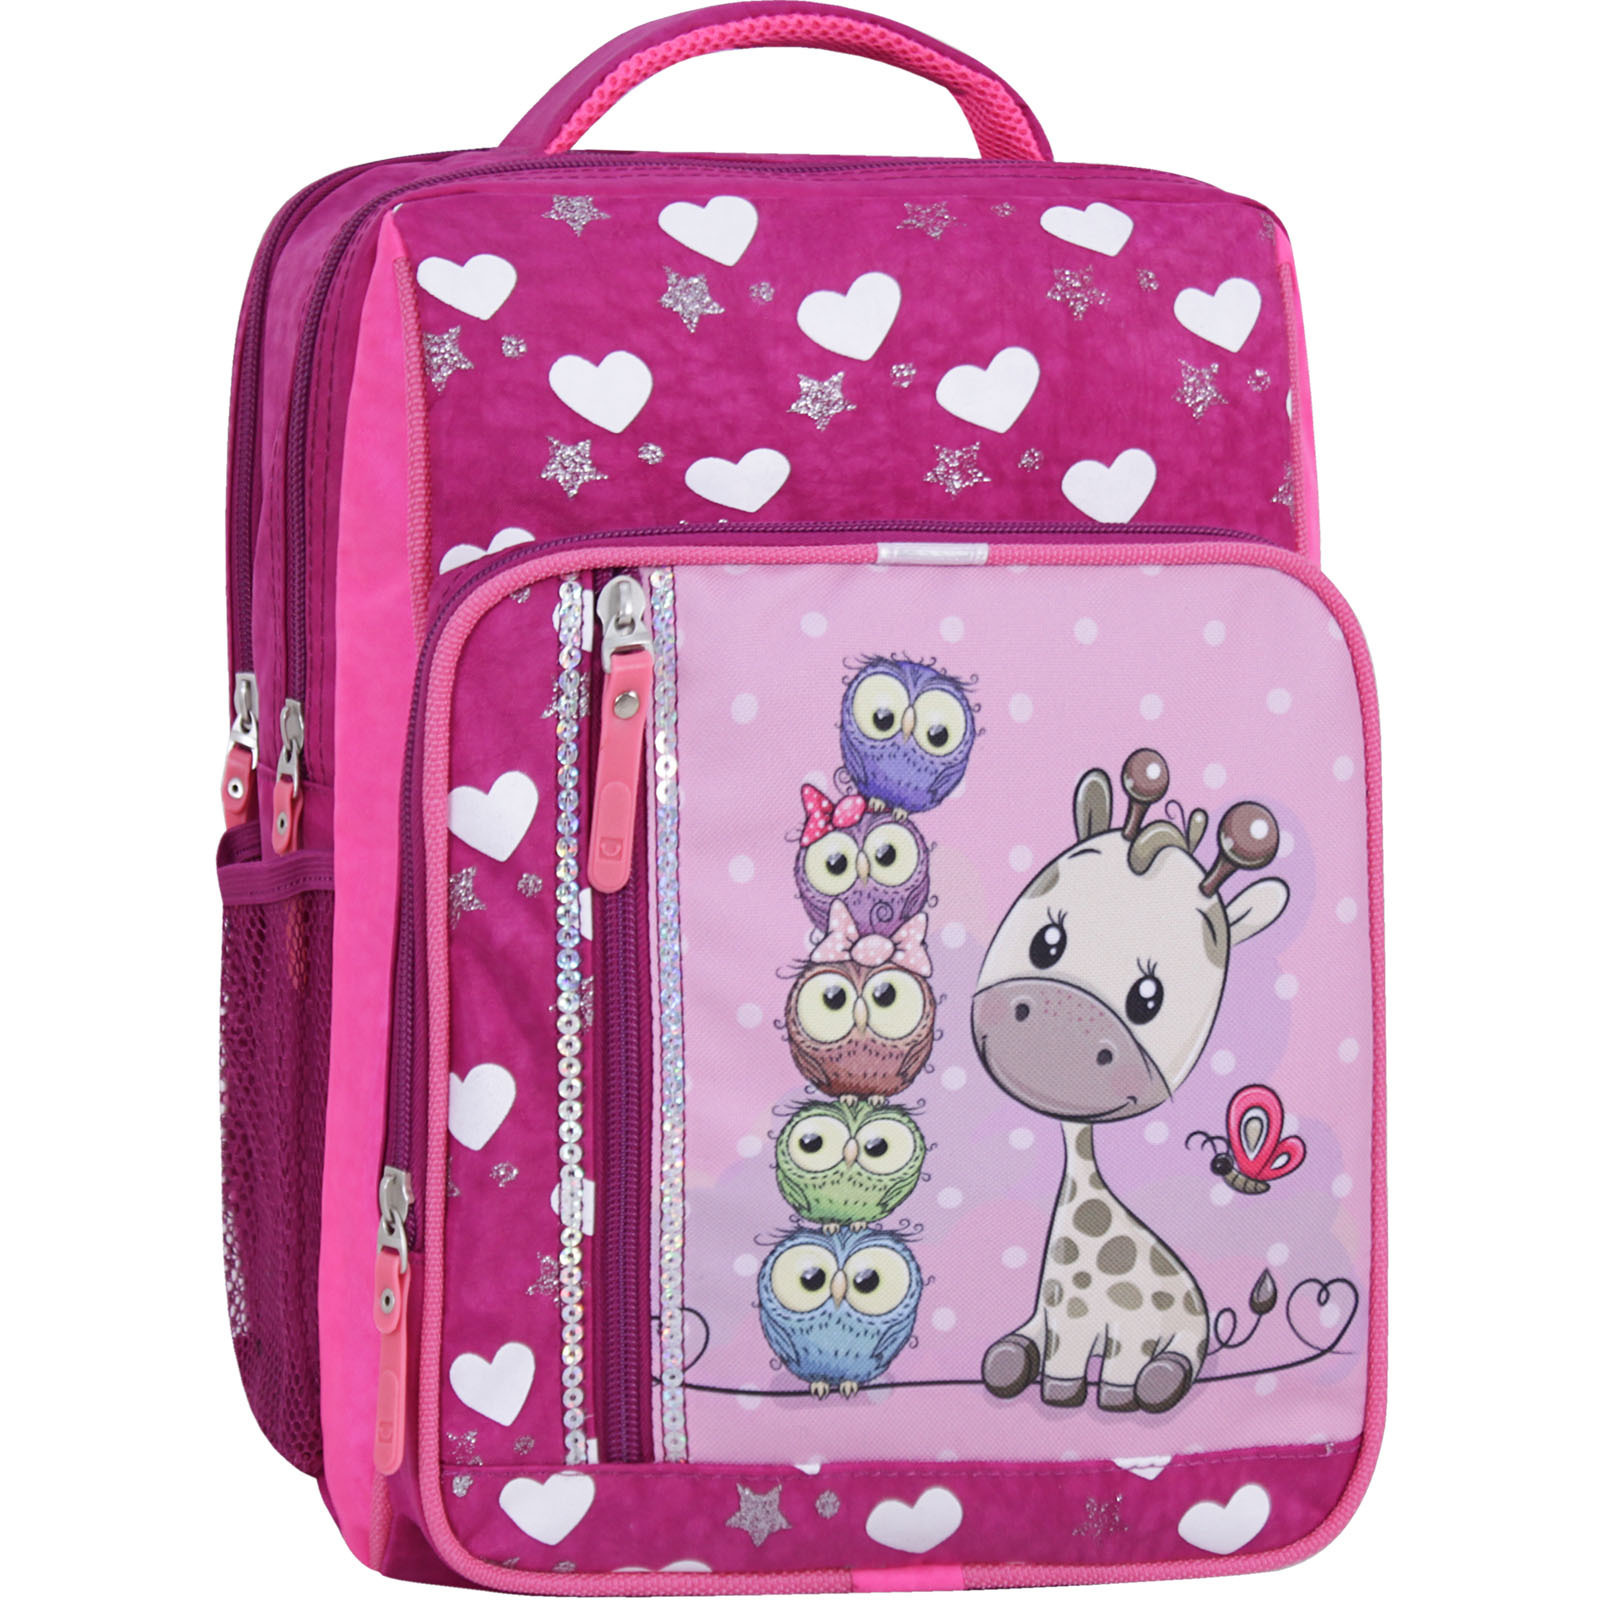 Школьные рюкзаки Рюкзак школьный Bagland Школьник 8 л. 143 малиновый 682 (0012870) IMG_2732_суб.682_-1600.jpg